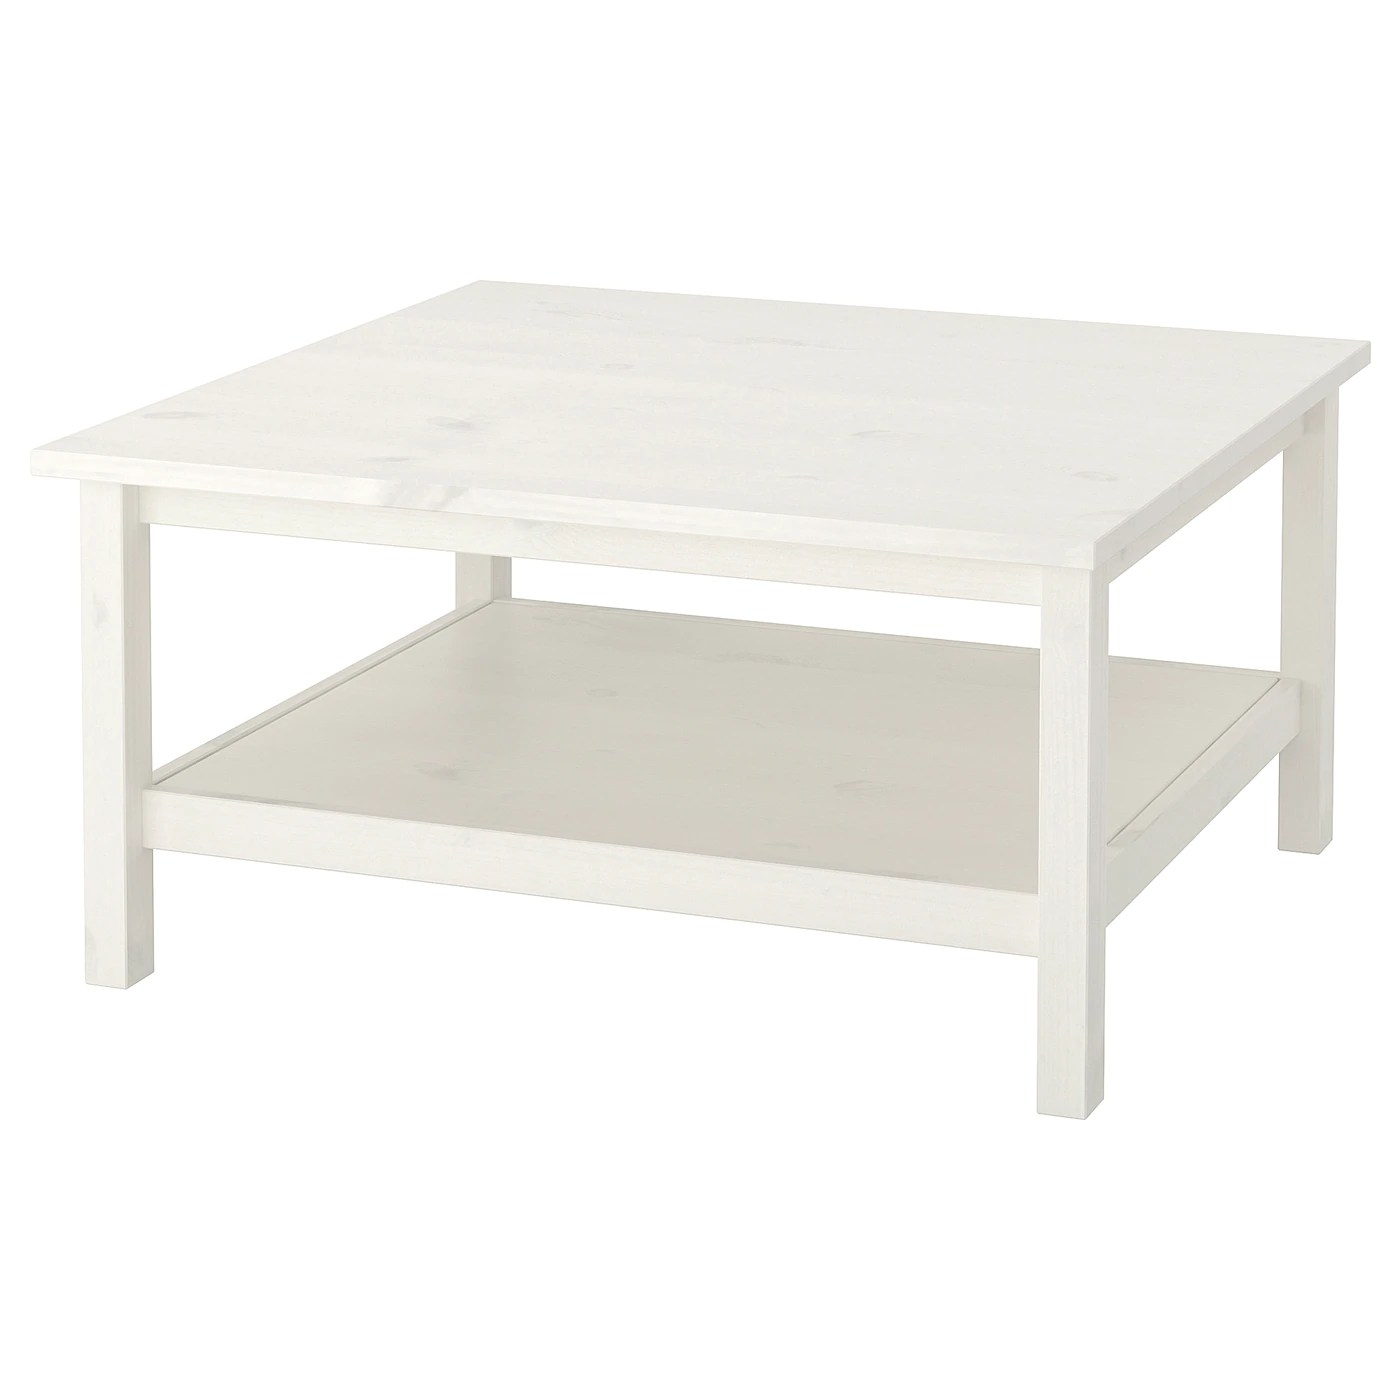 hemnes coffee table white stain 35 3 8x35 3 8 90x90 cm